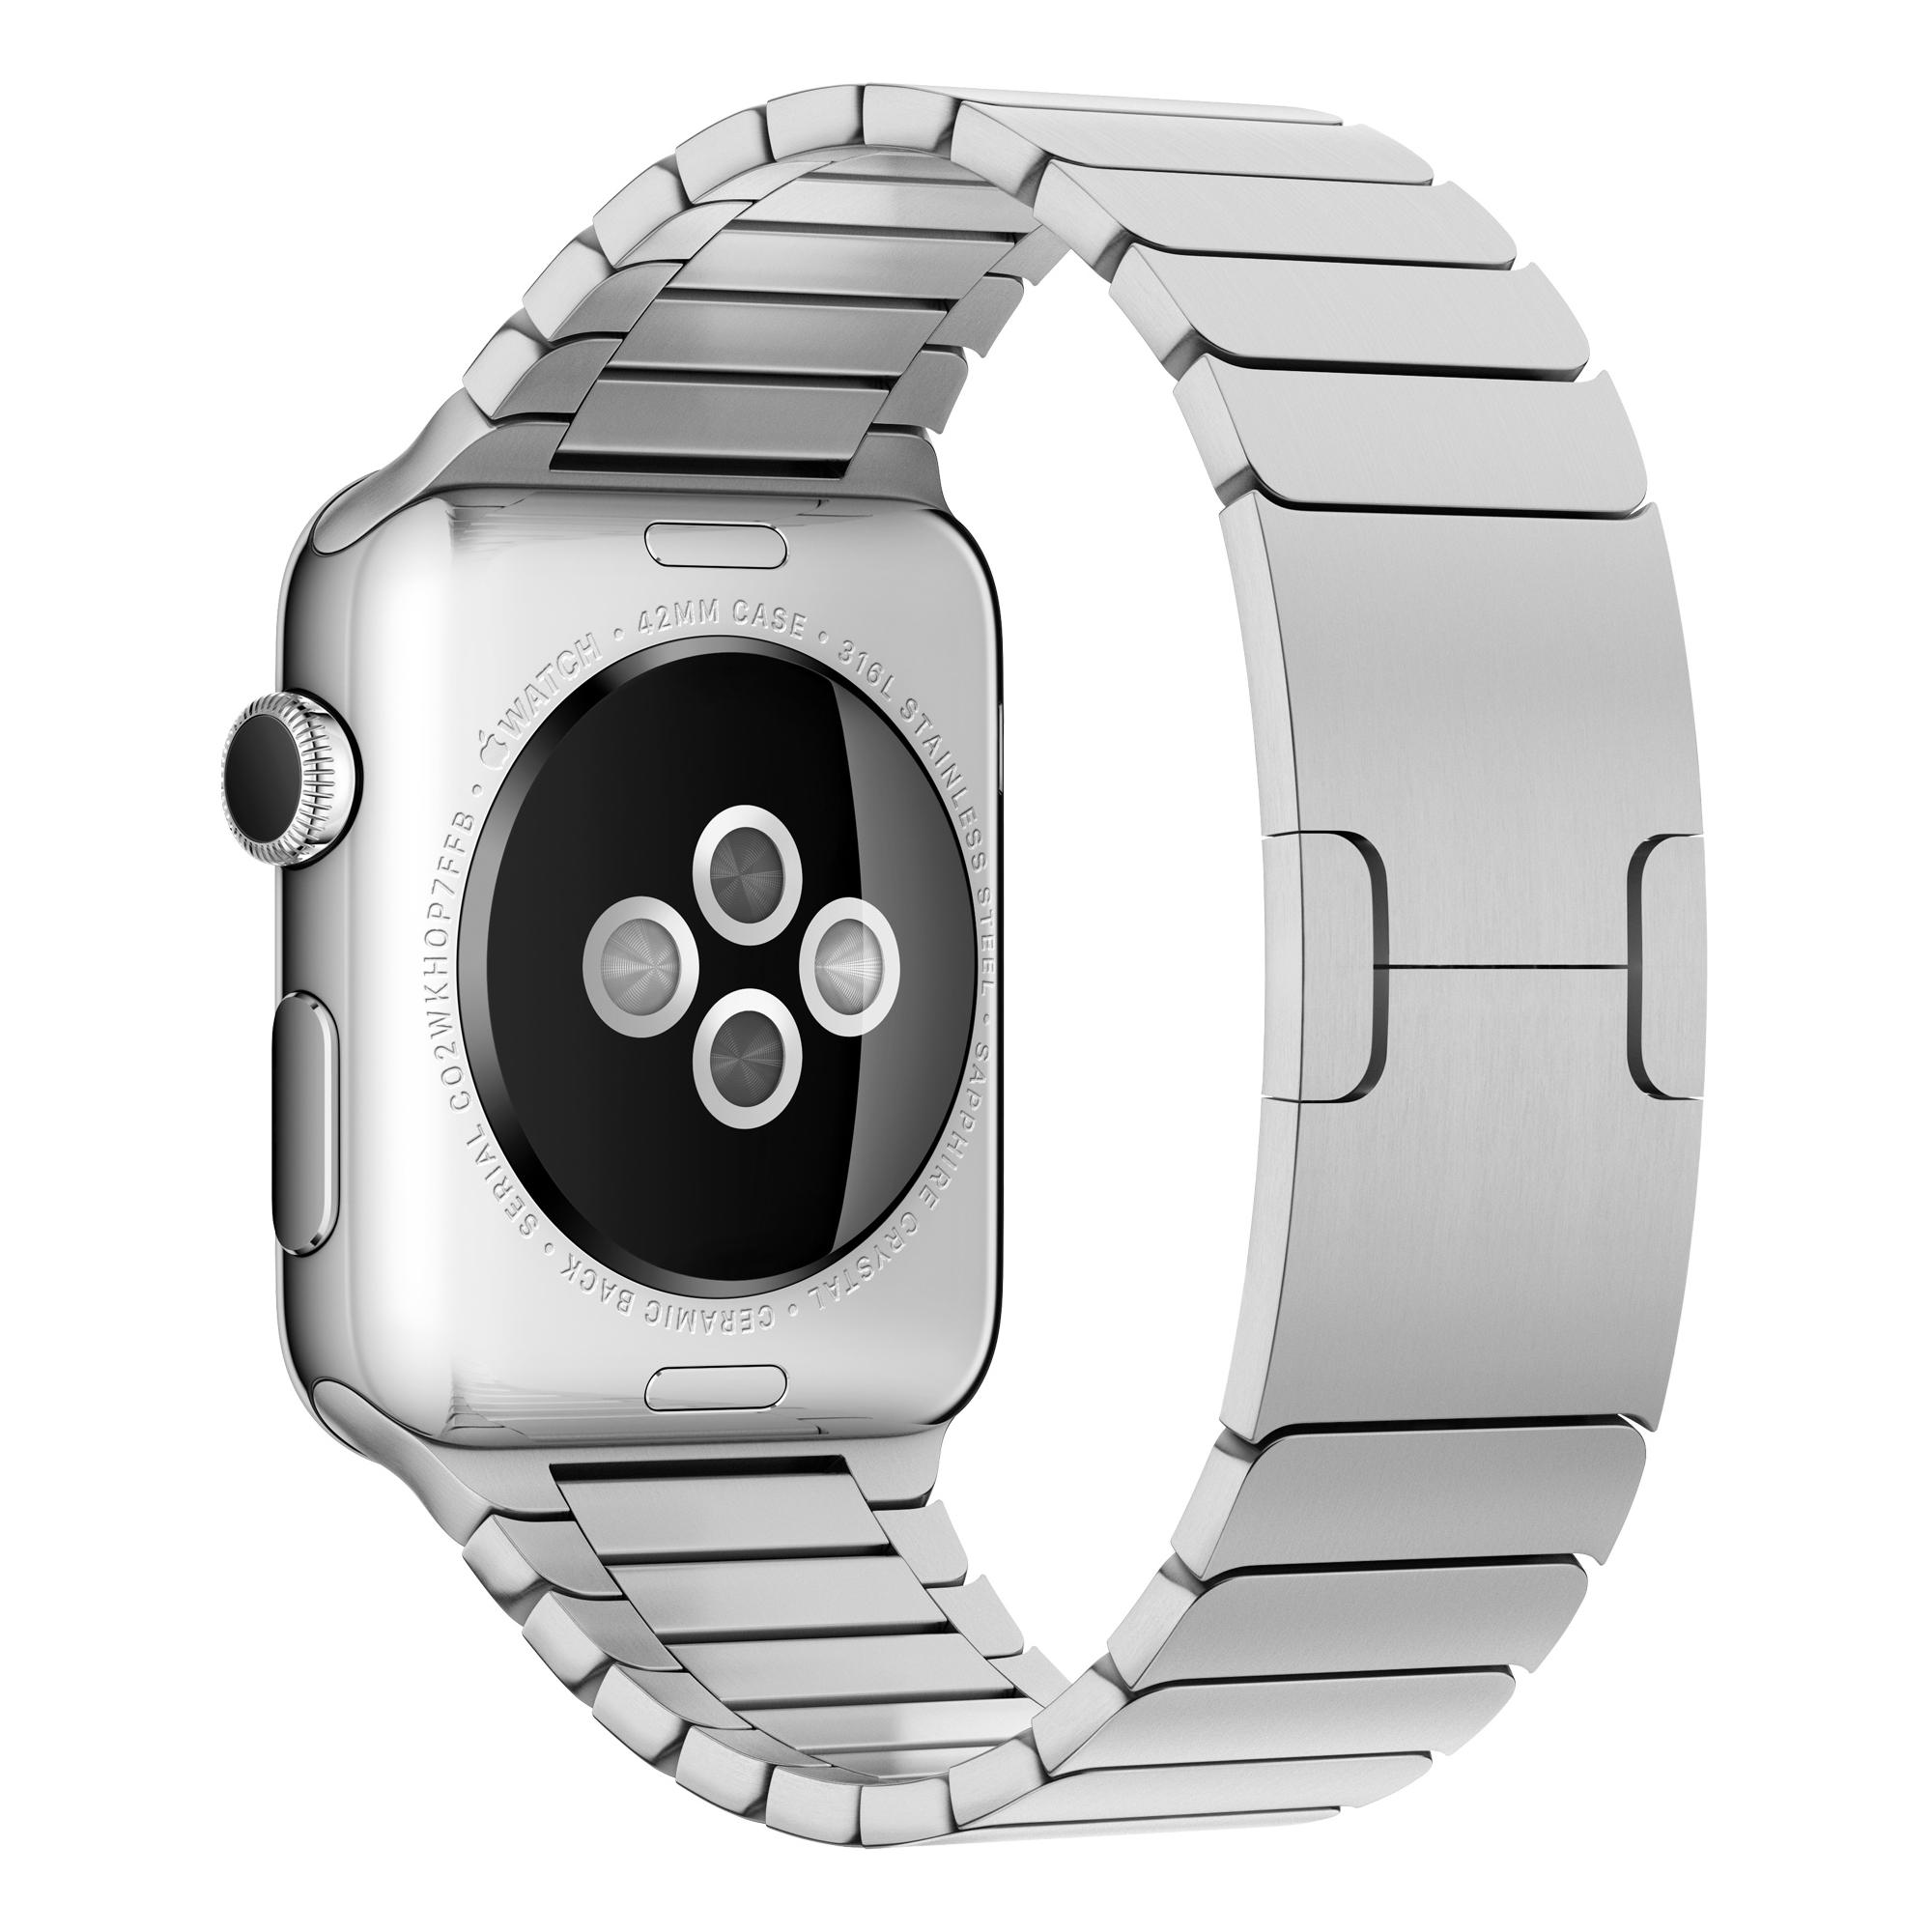 Apple-Watch-2015-hero-101